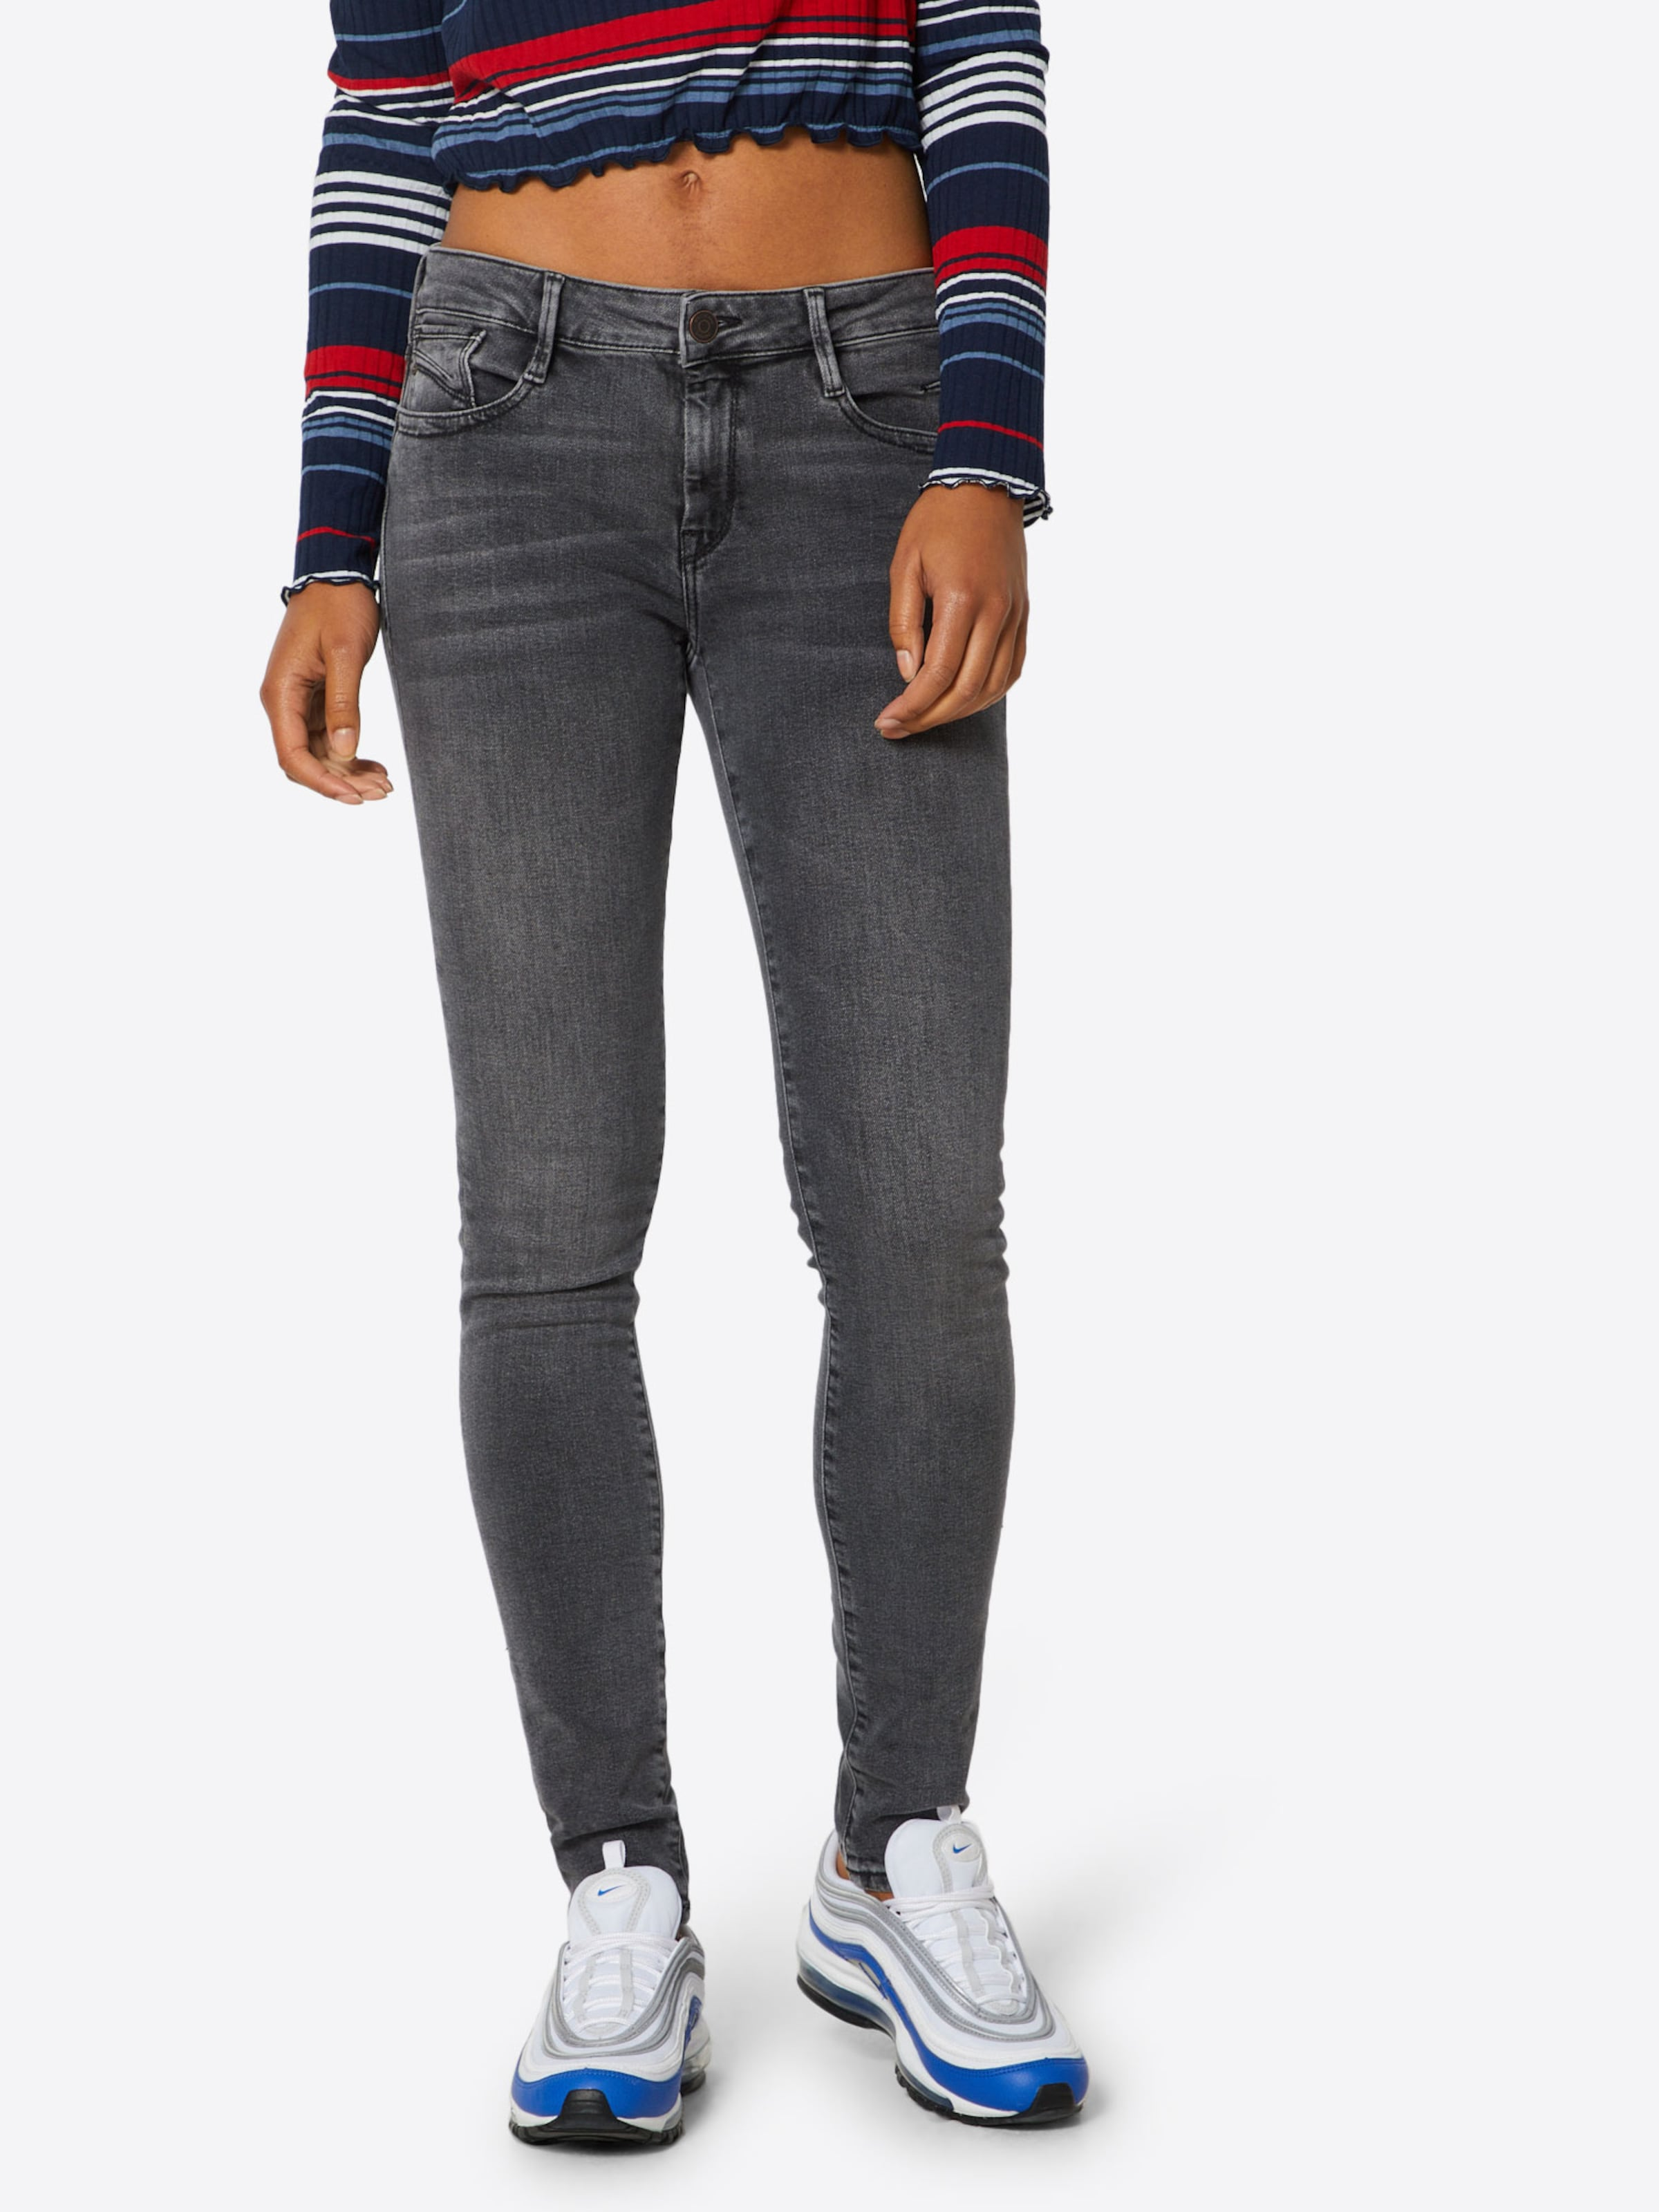 Jeans In Mavi In 'adriana' Jeans Dunkelgrau Mavi 'adriana' Dunkelgrau OvNnm80w